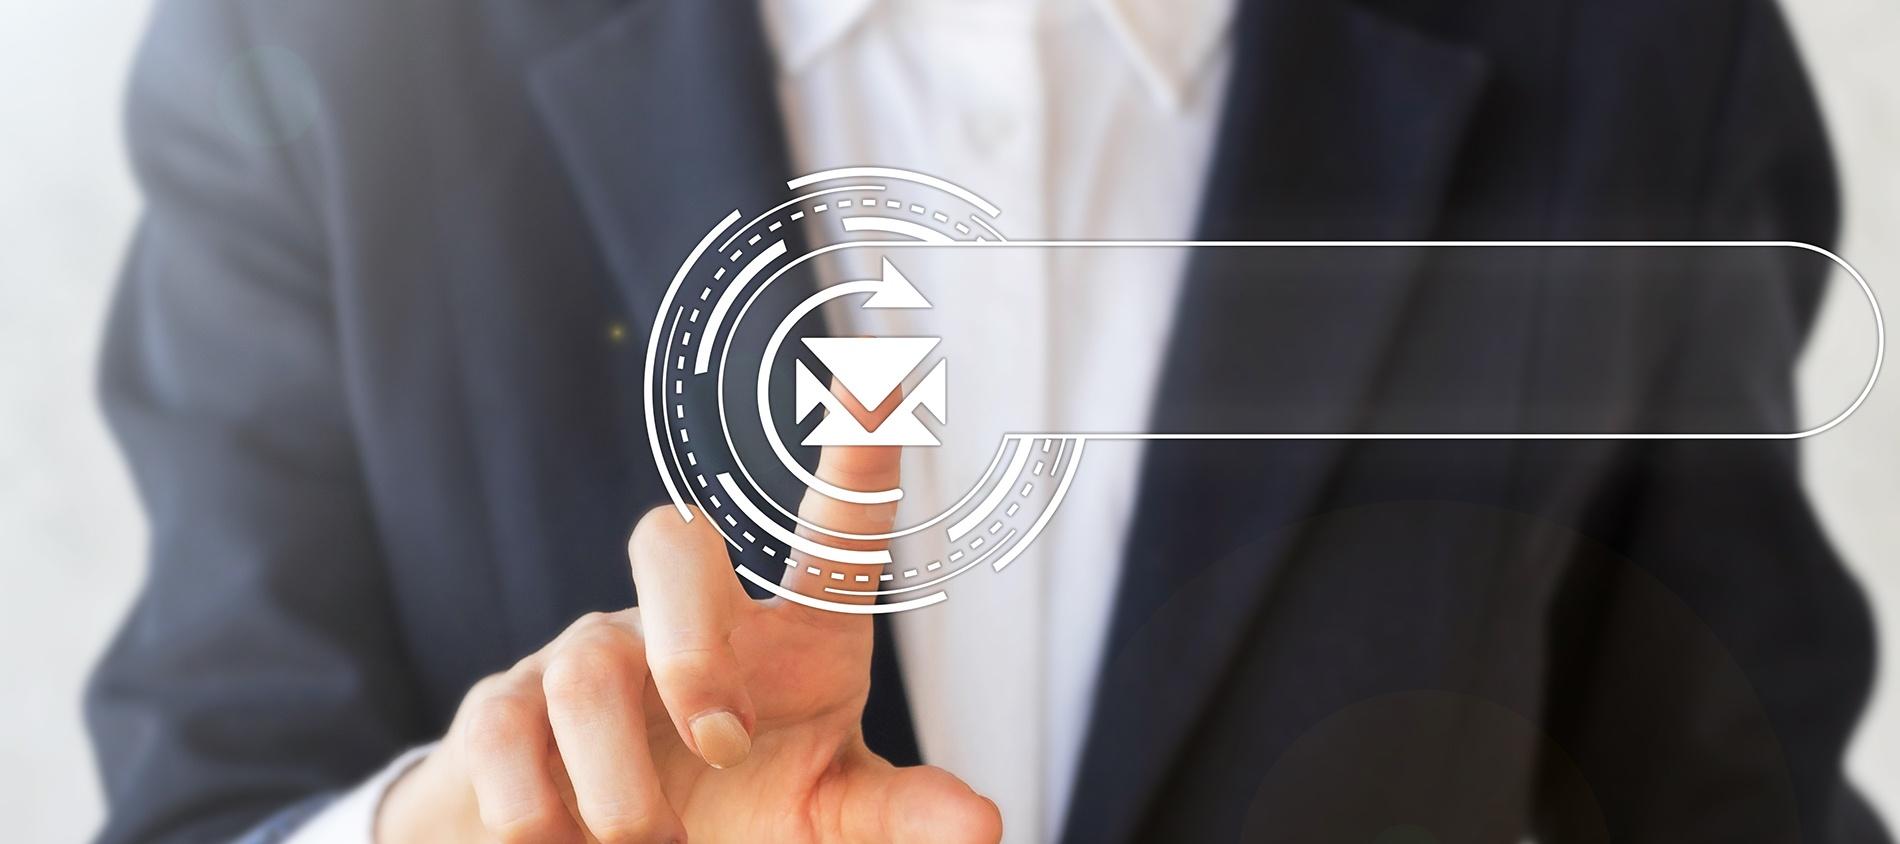 El E-Mailing como estrategia de ventas